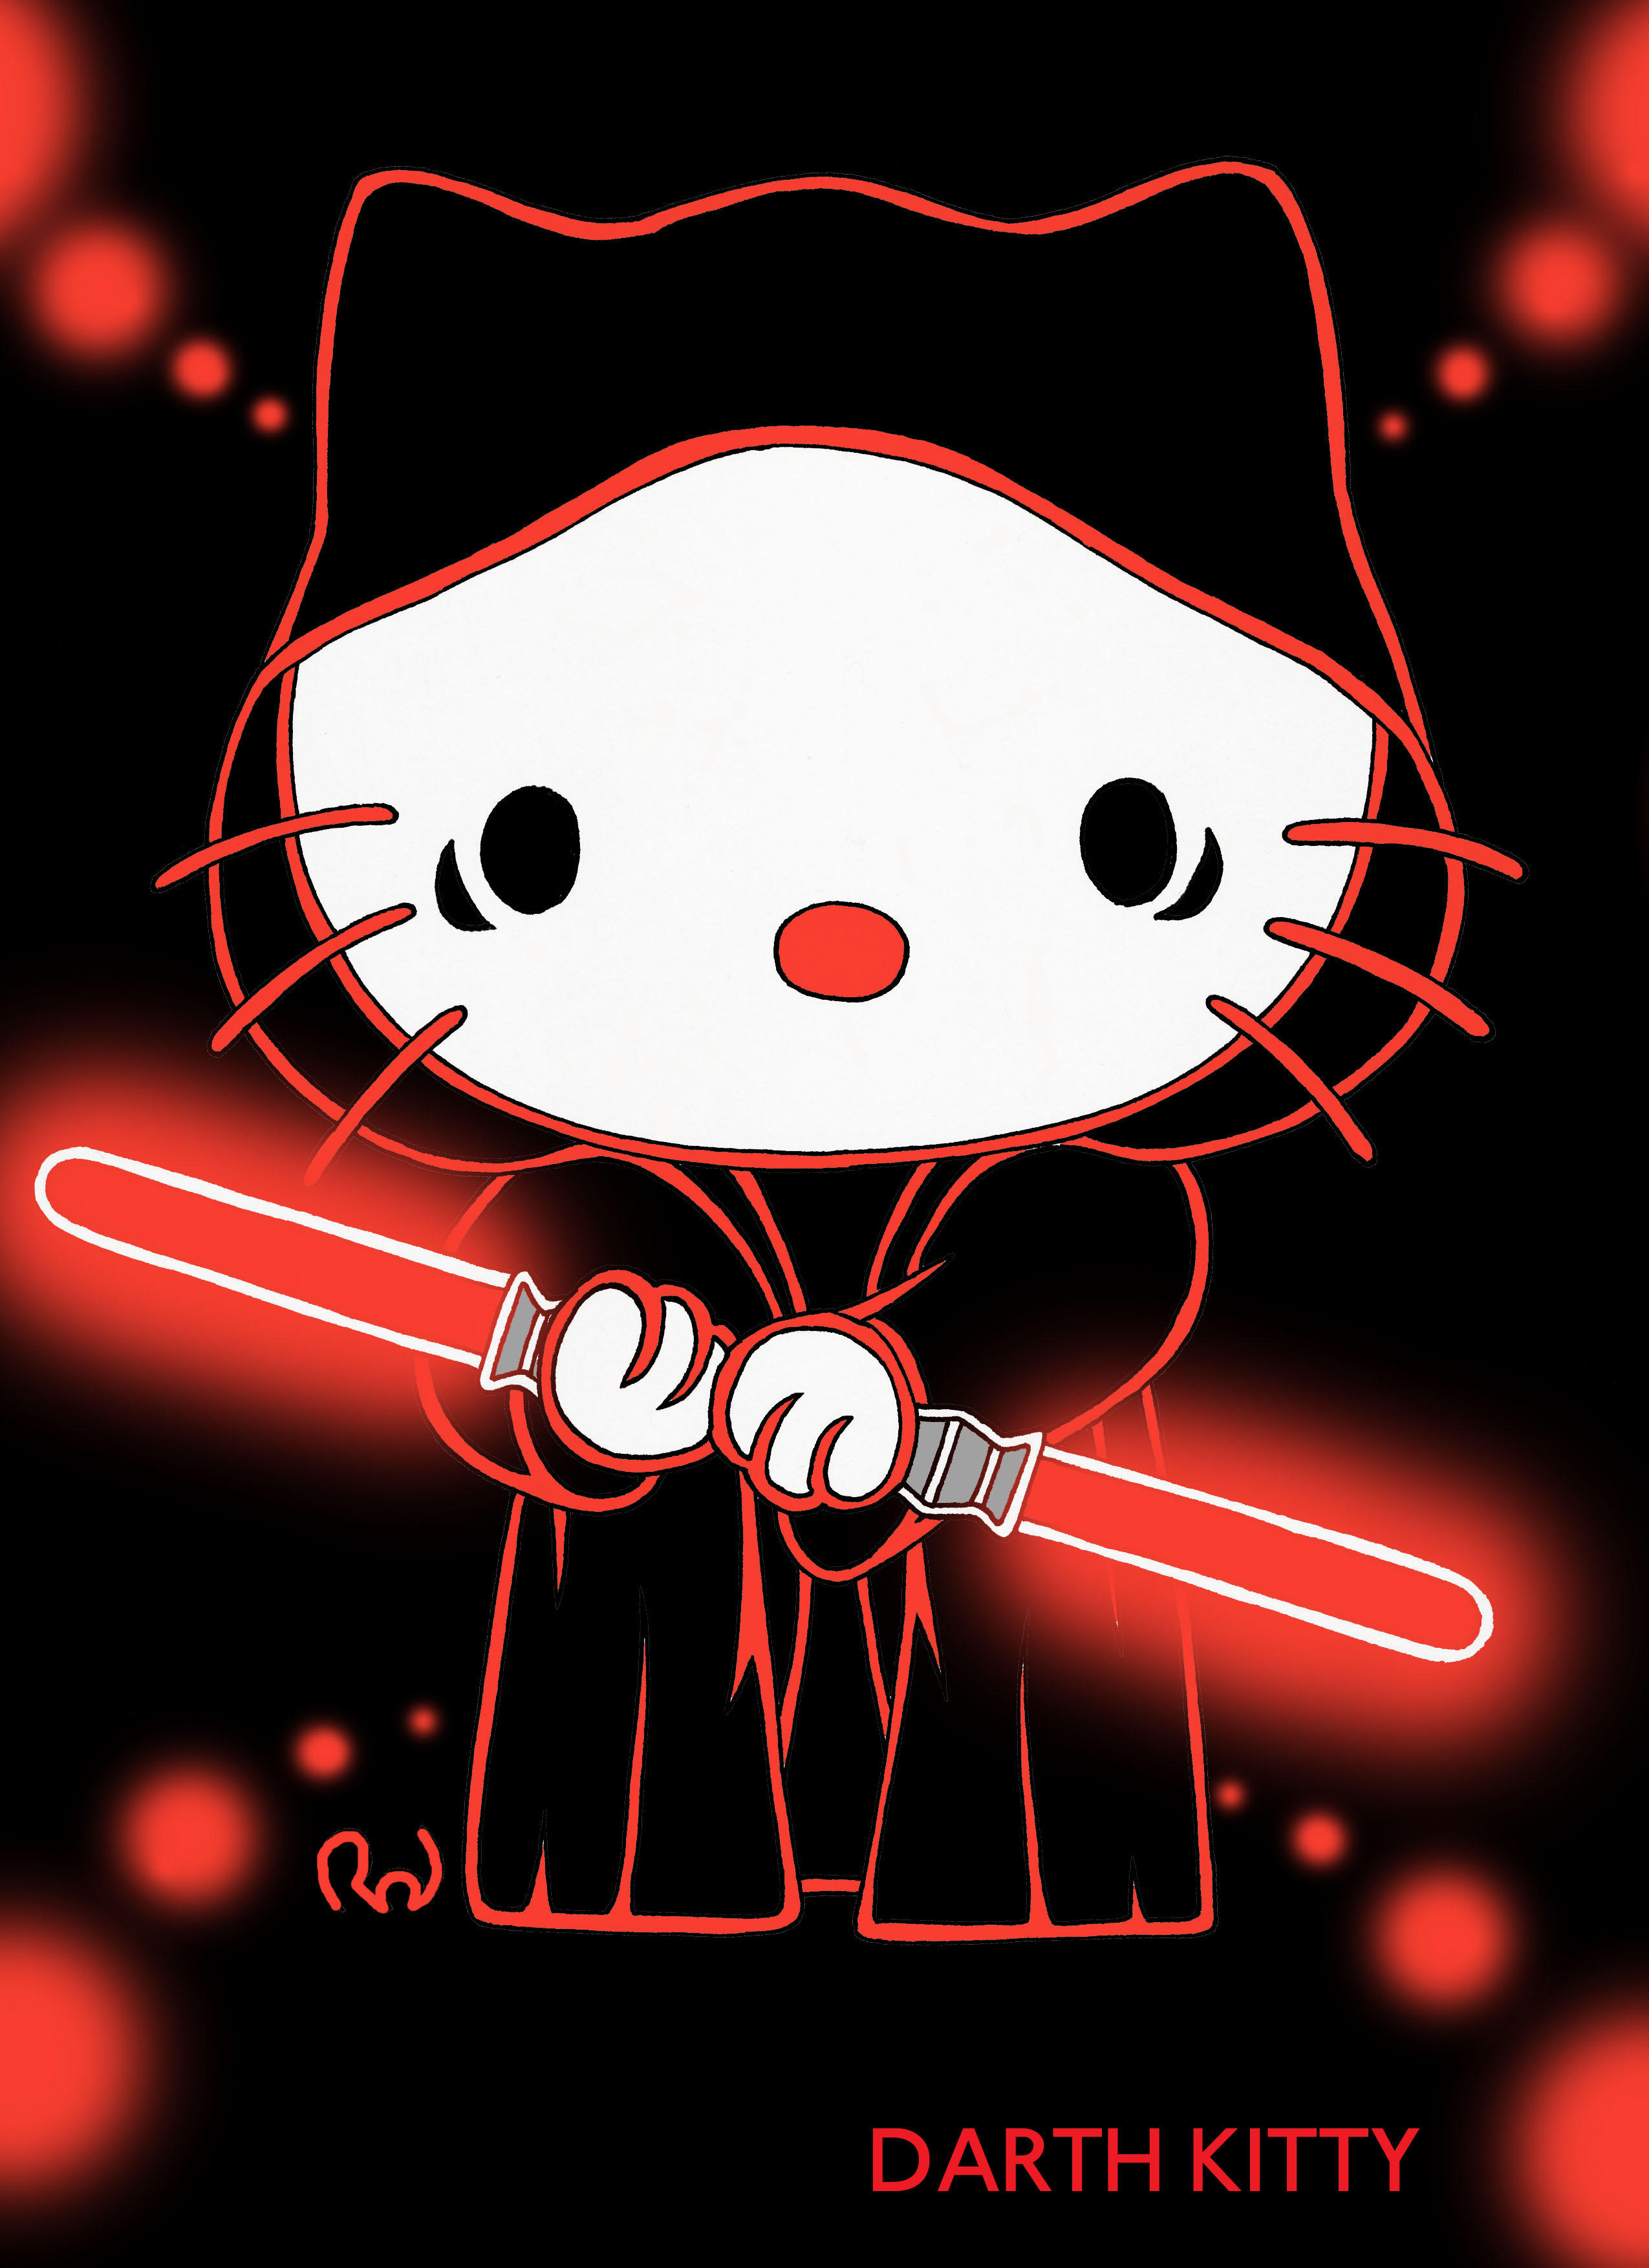 Download Wallpaper Hello Kitty Neon - darth_kitty_by_hightower67  2018_647919.jpg